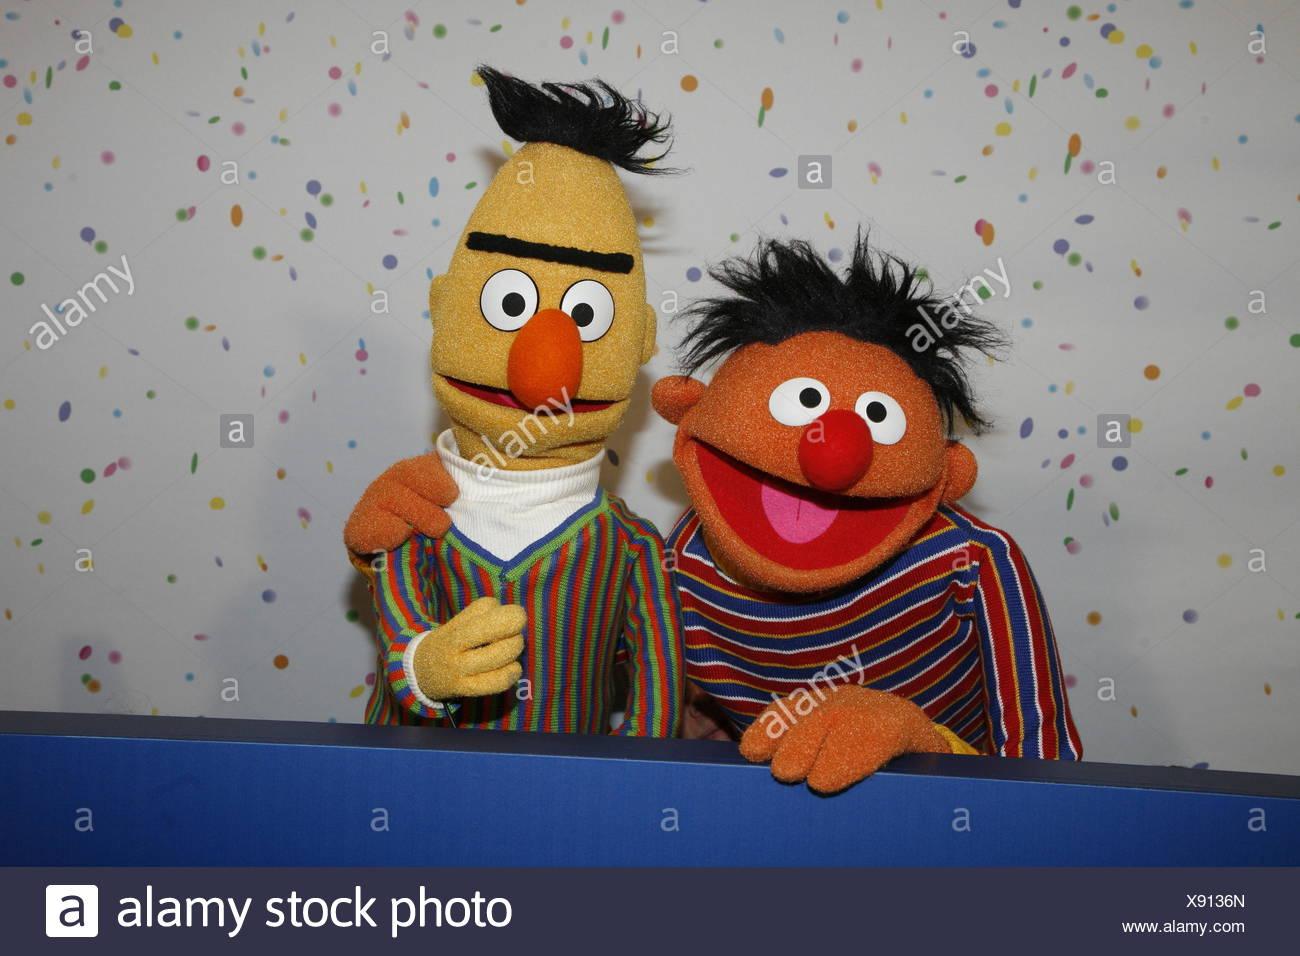 TV series, Sesame Street, DEU 1973 - ???, Ernie and Bert, NDR and